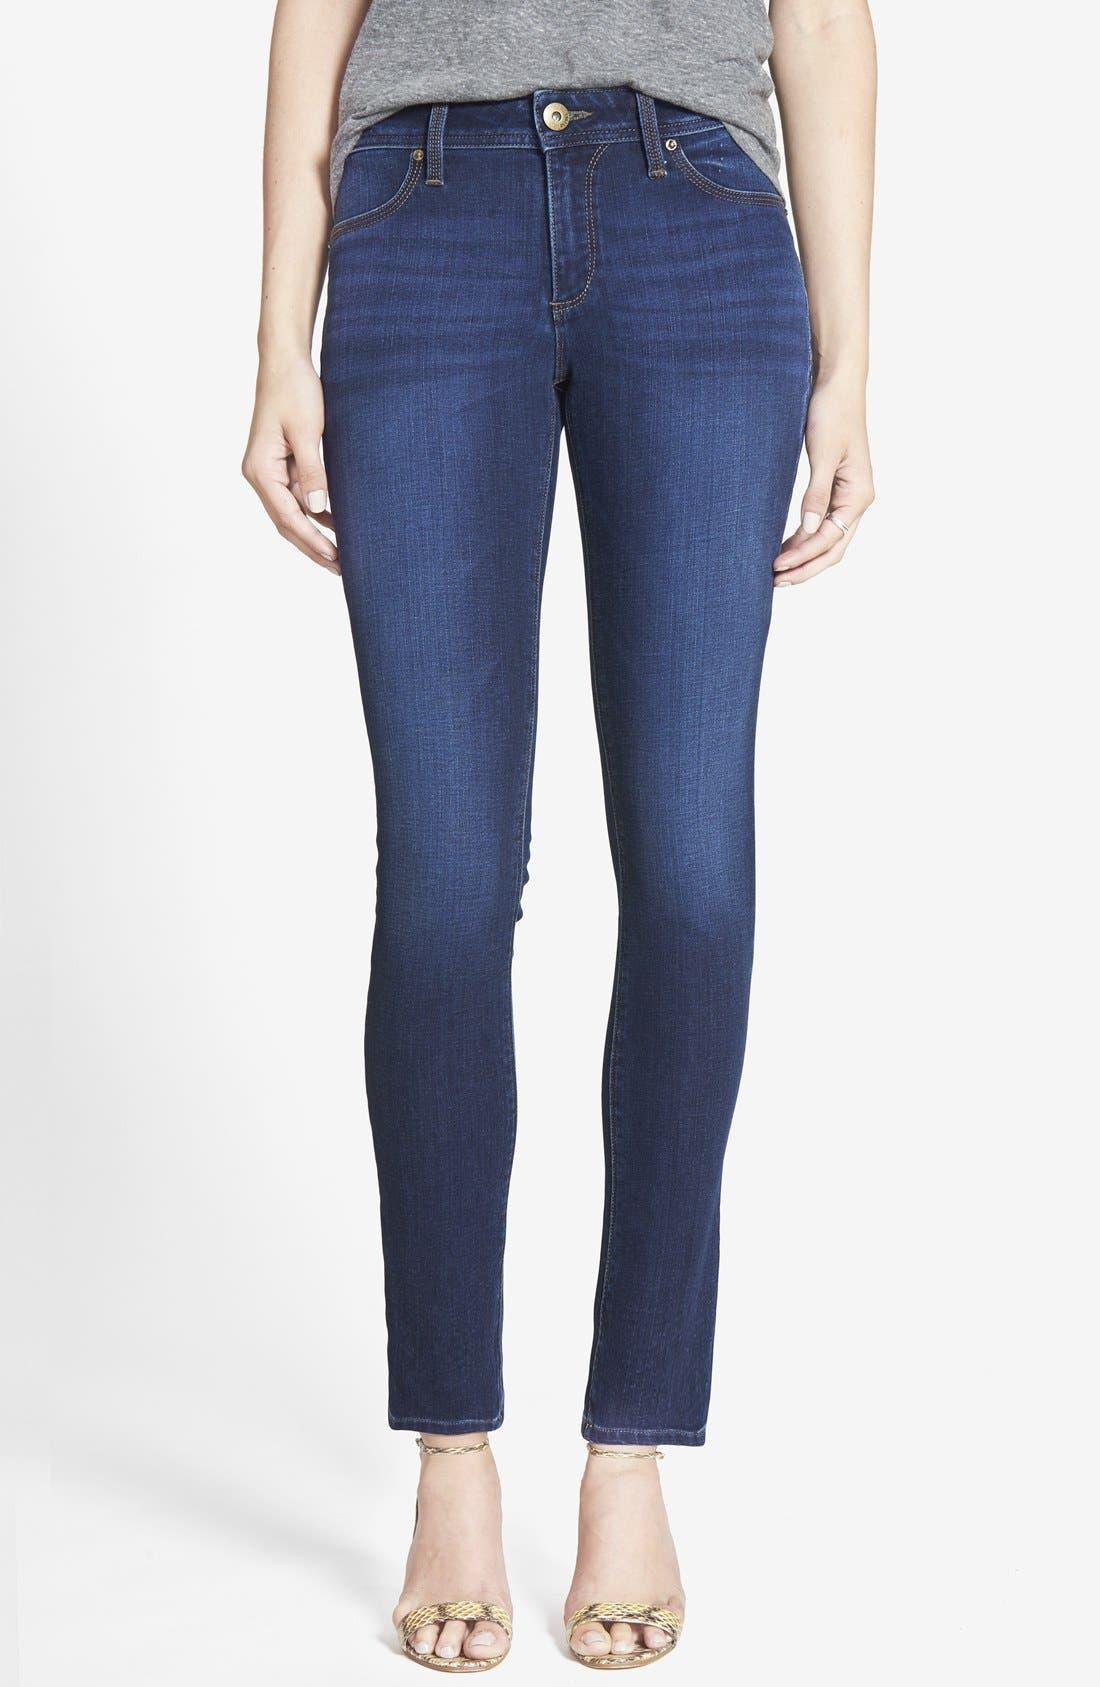 DL1961 'Emma' Power Legging Jeans, Main, color, ALBANY